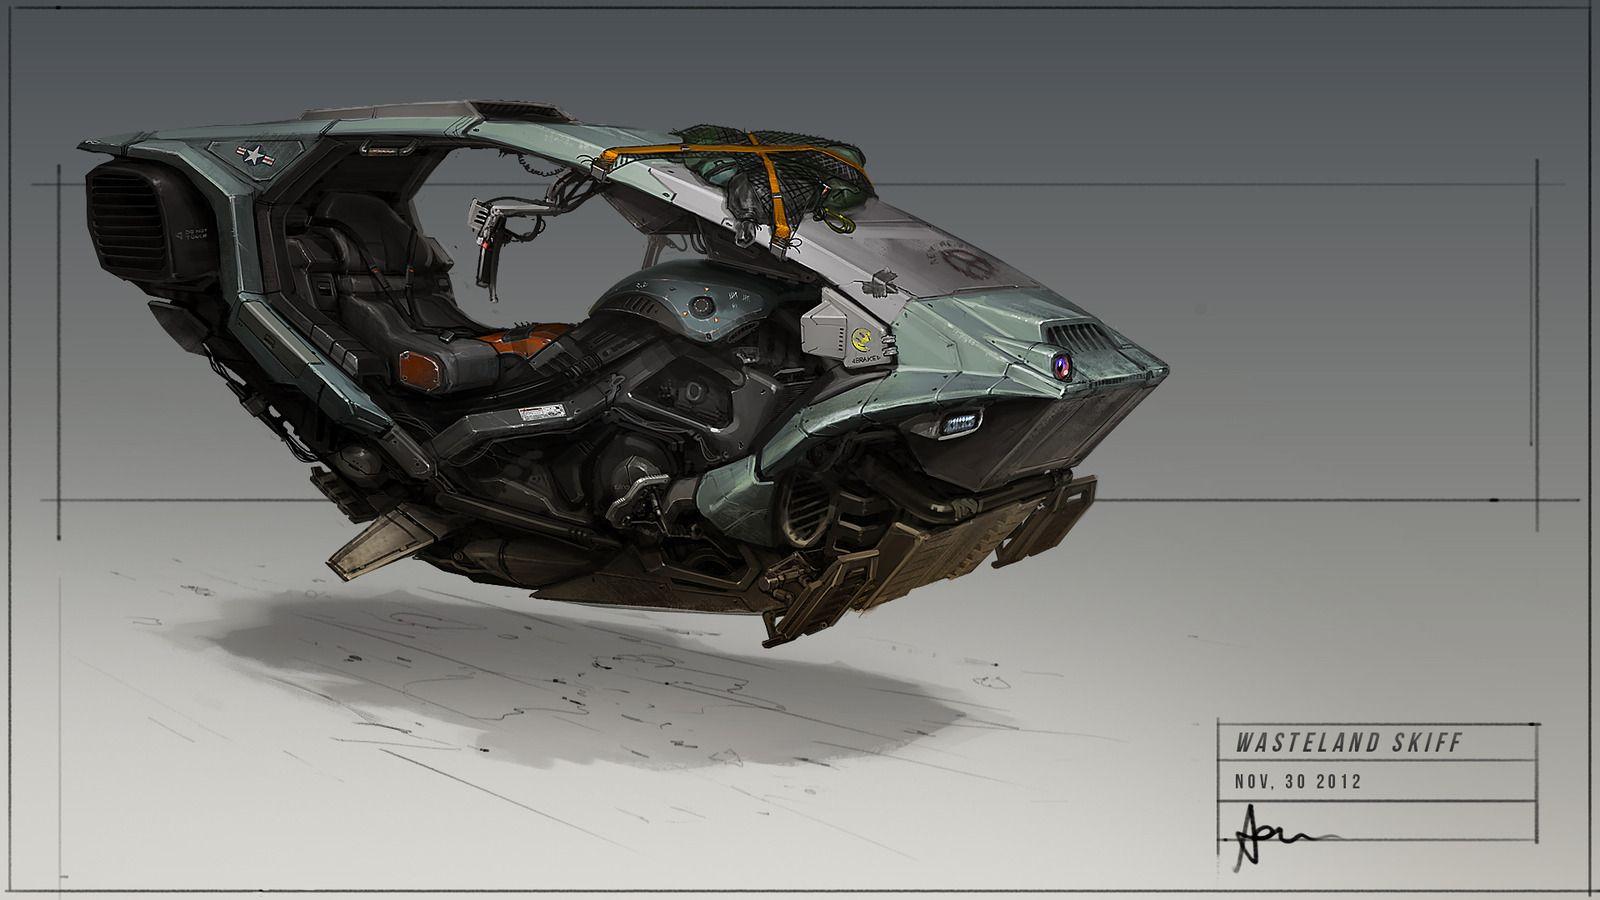 Wasteland Skiff Picture (2d, automotive, antigravity, sci-fi, hover, bike, transport, skiff)